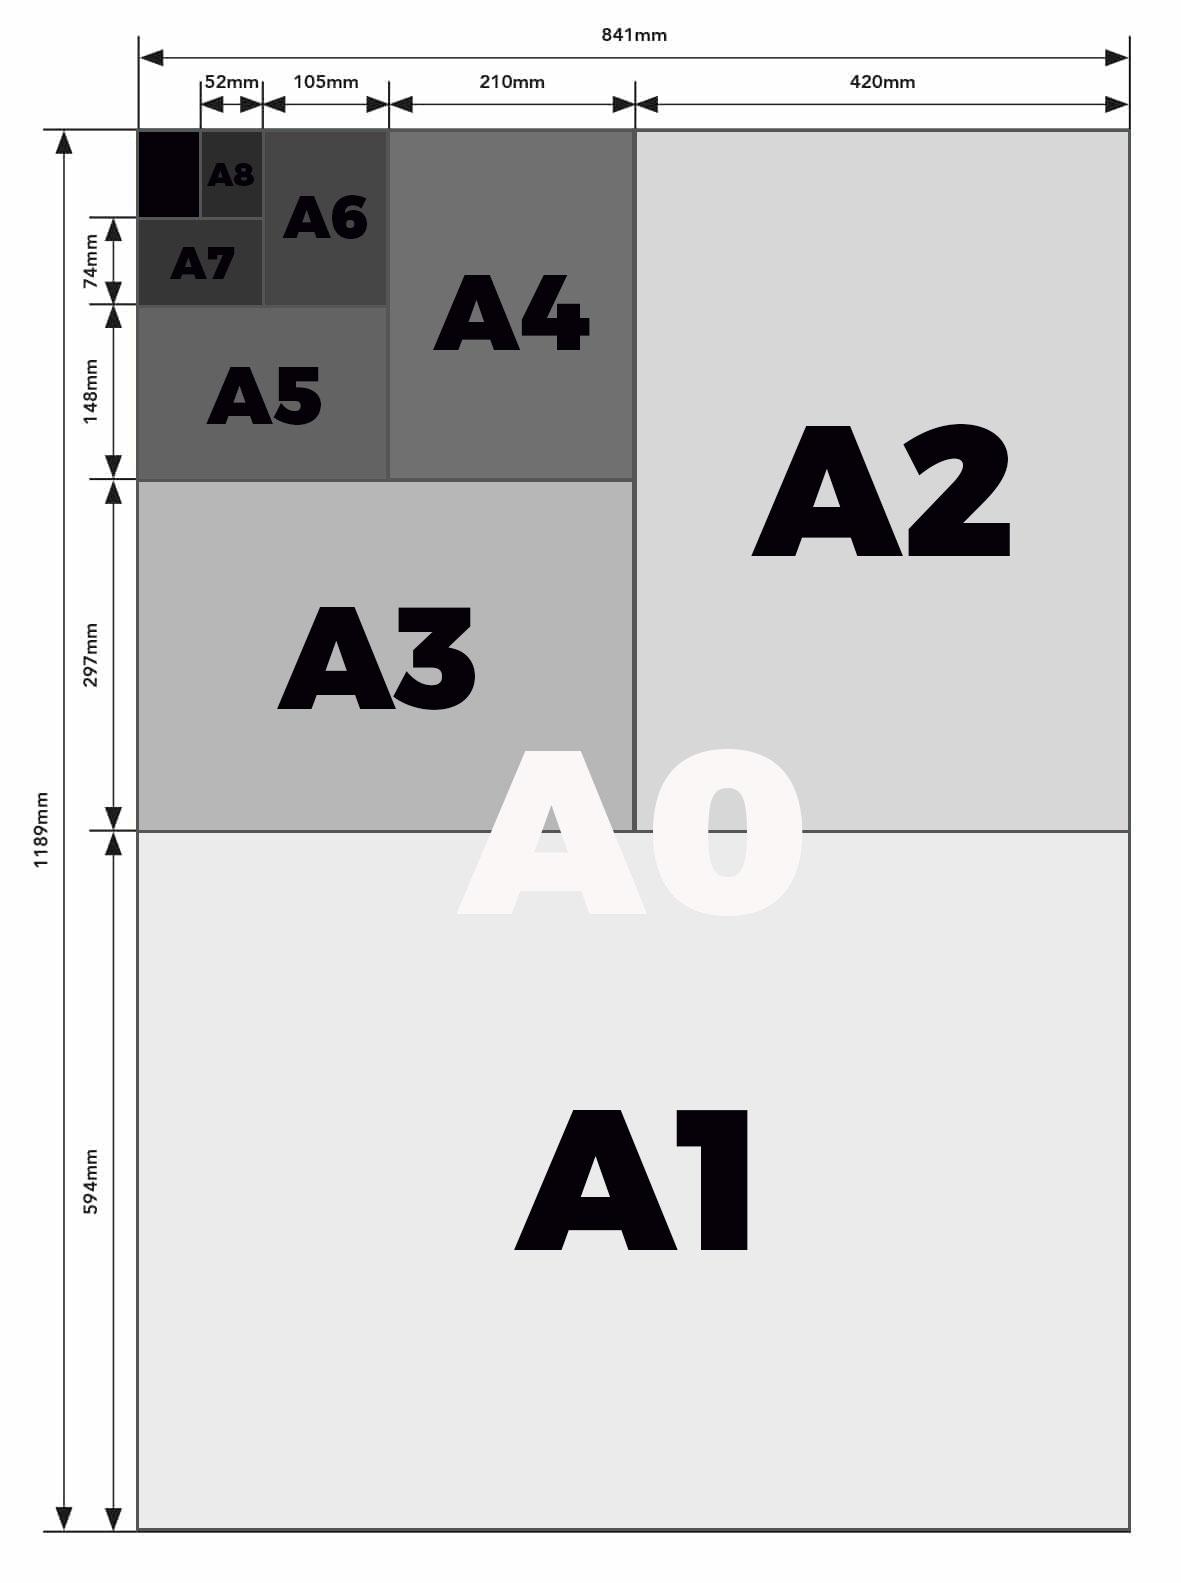 A paper size chart